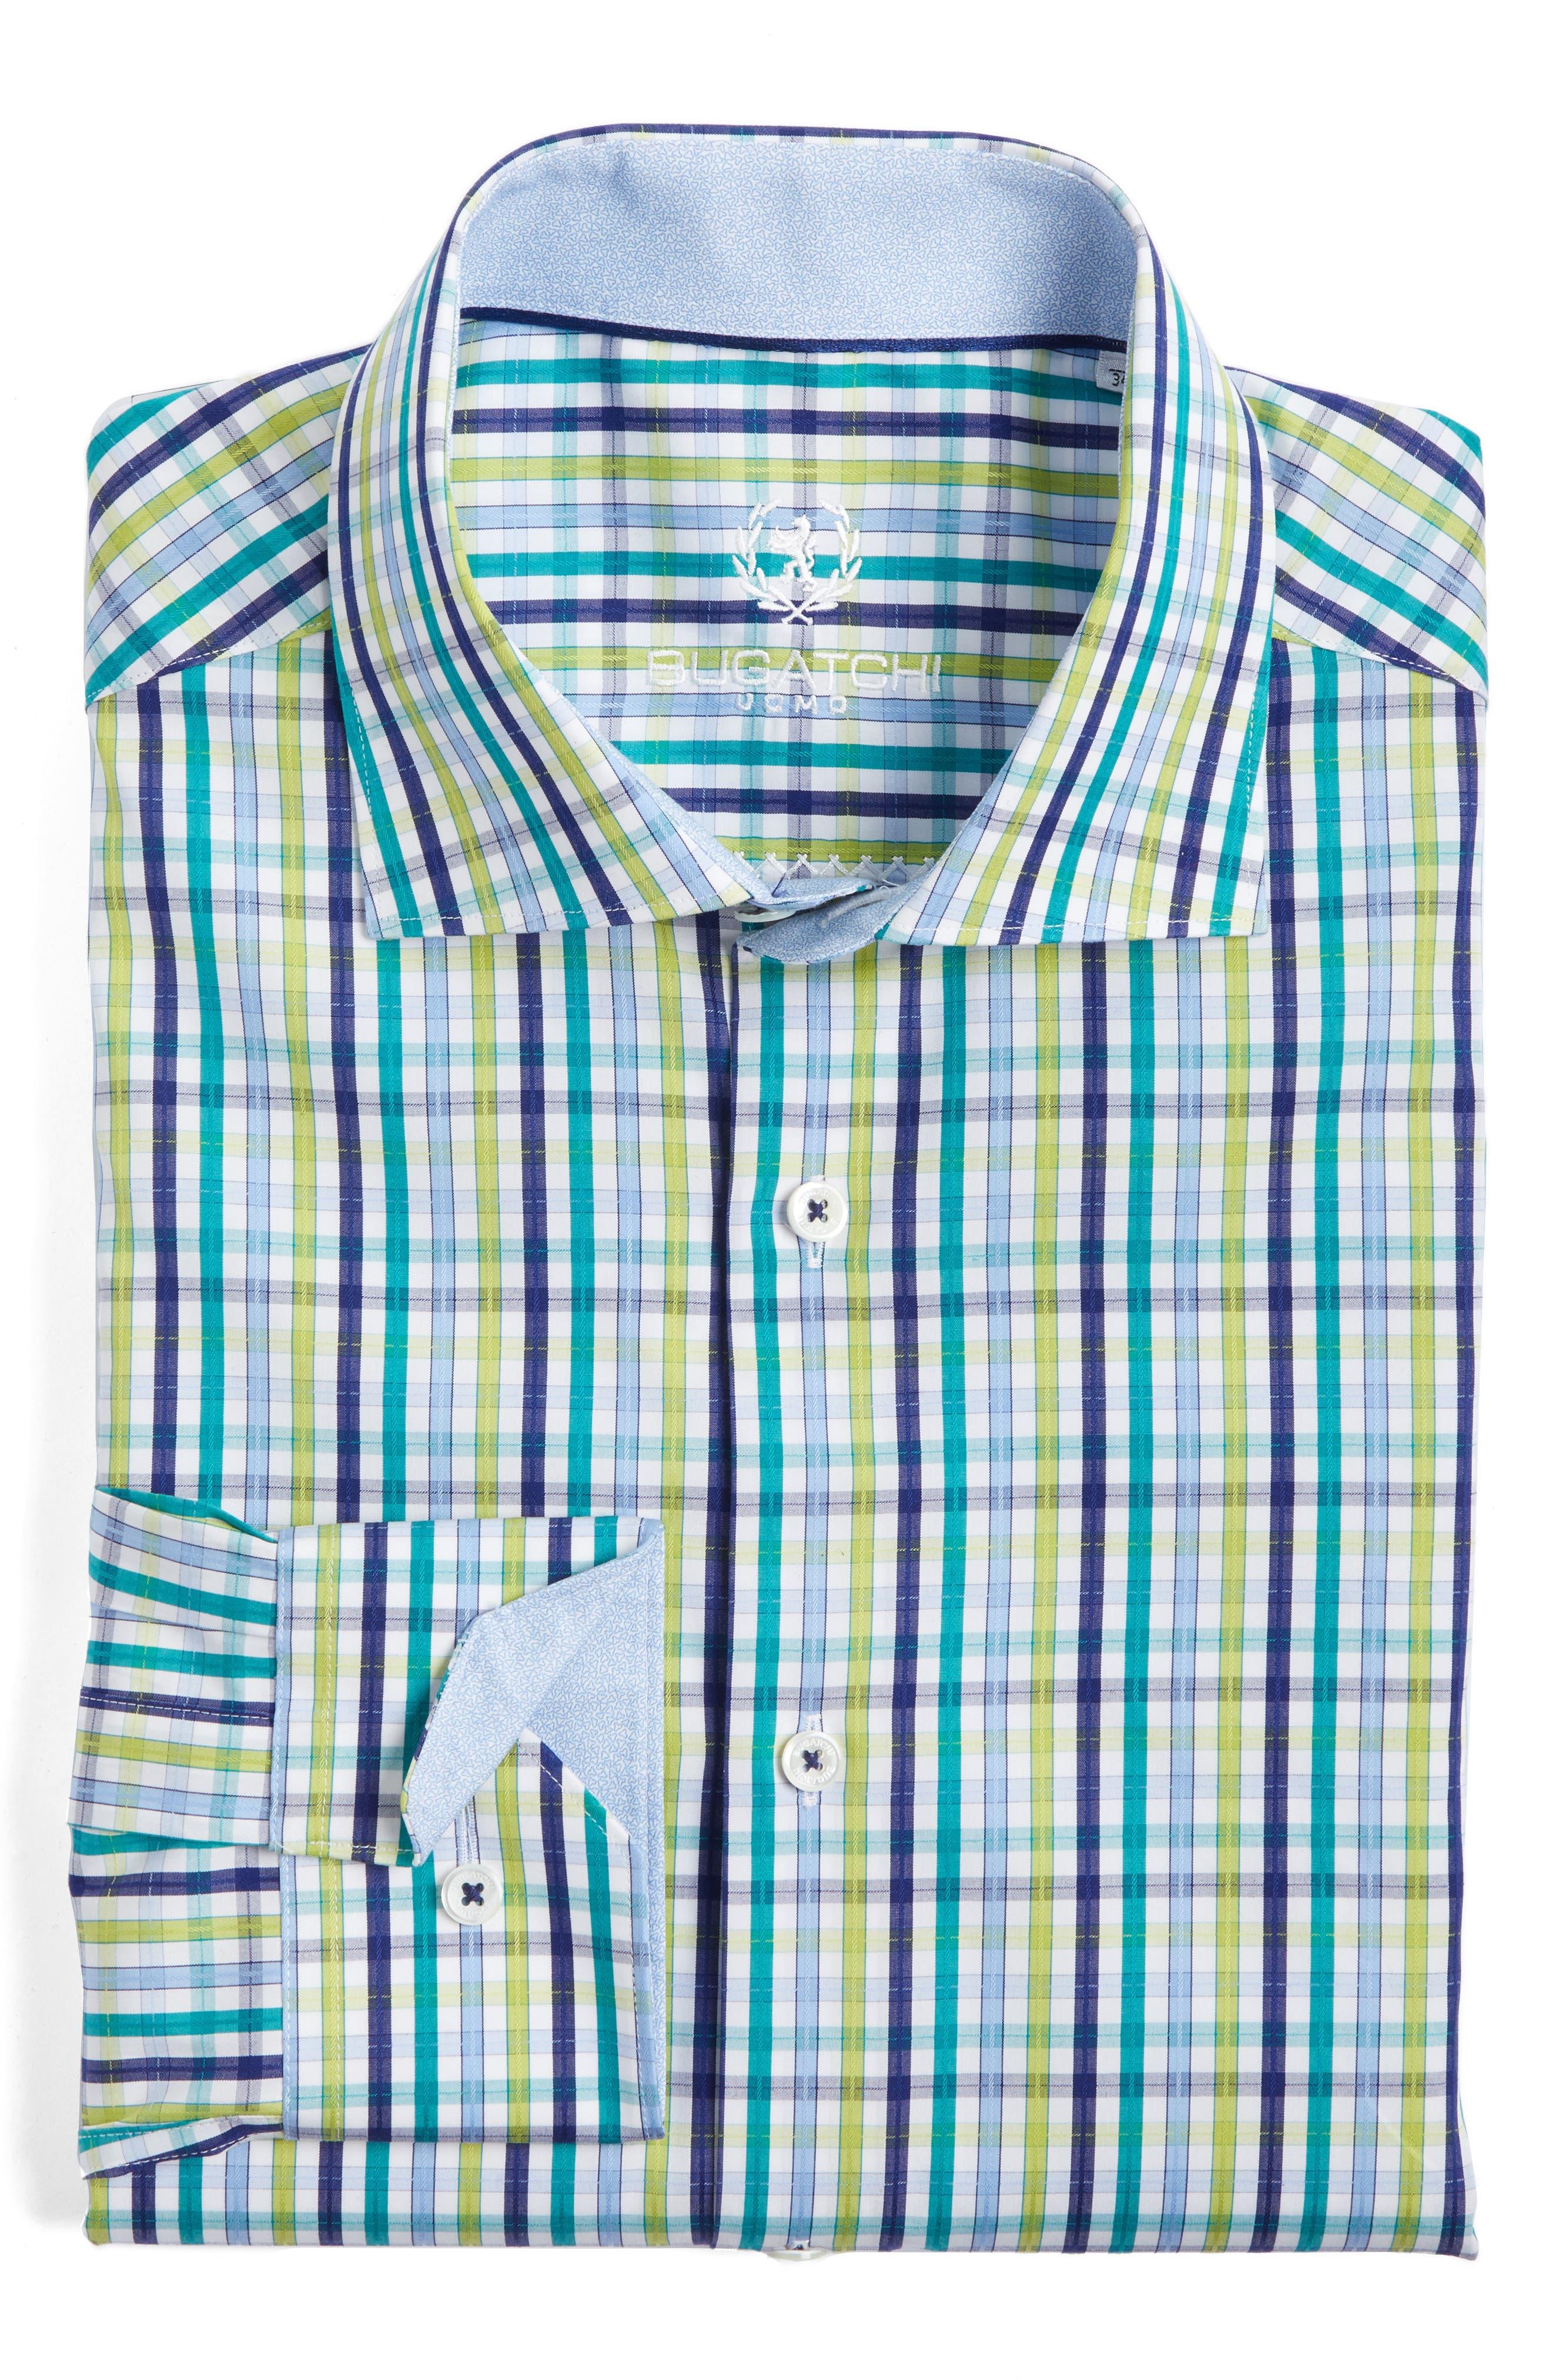 Alternate Image 1 Selected - Bugatchi Trim Fit Check Dress Shirt